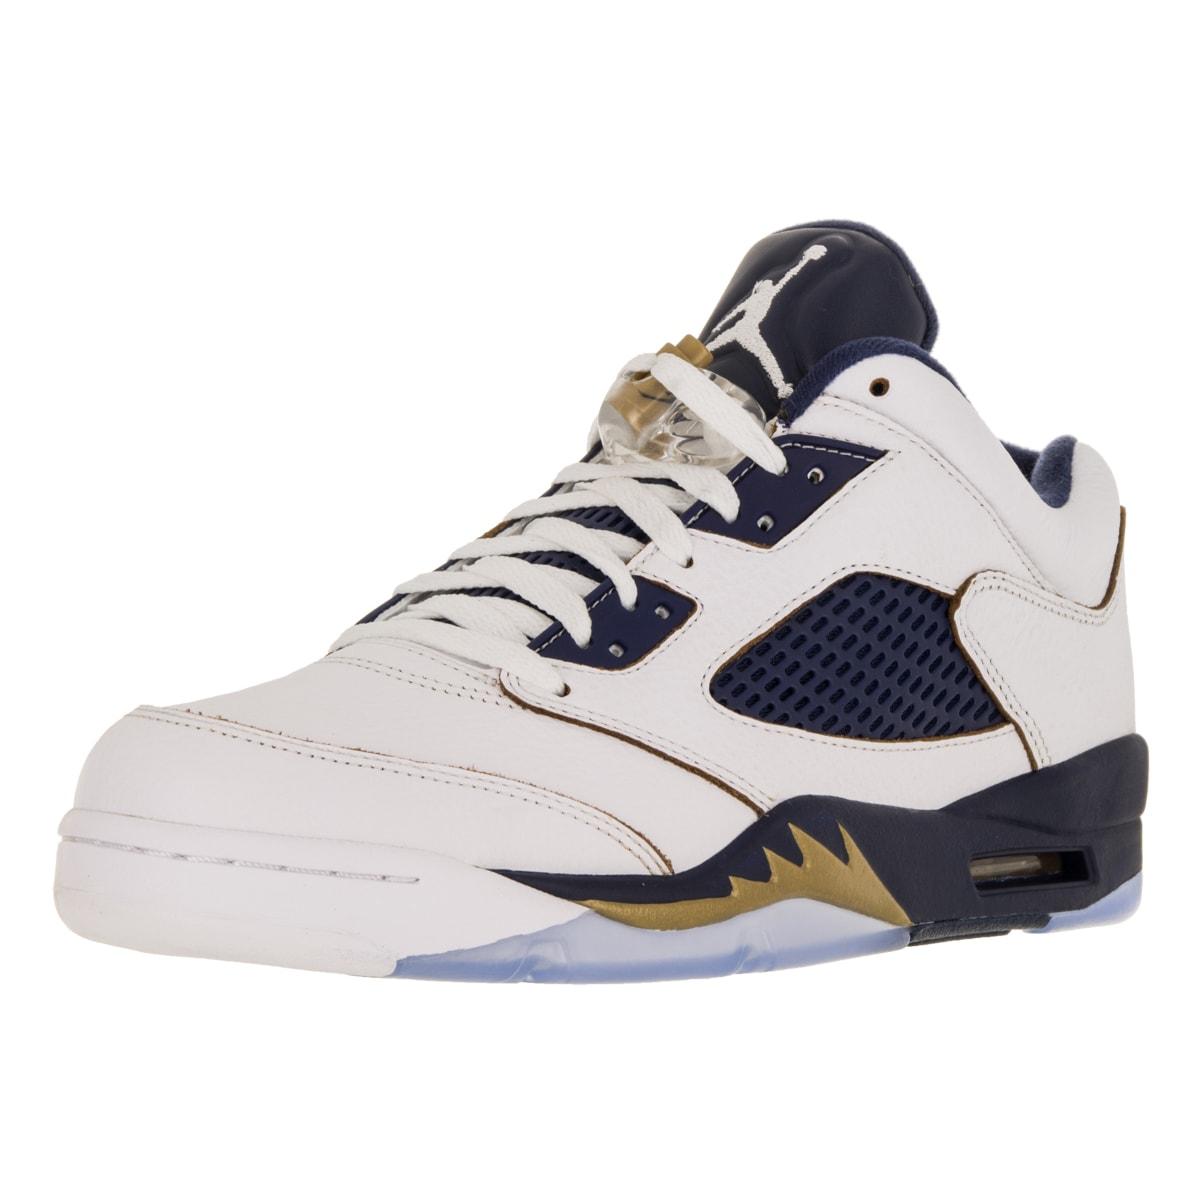 Nike Jordan Men's Air Jordan 5 Retro Low WhiteGold StarMid Navy Basketball Shoe